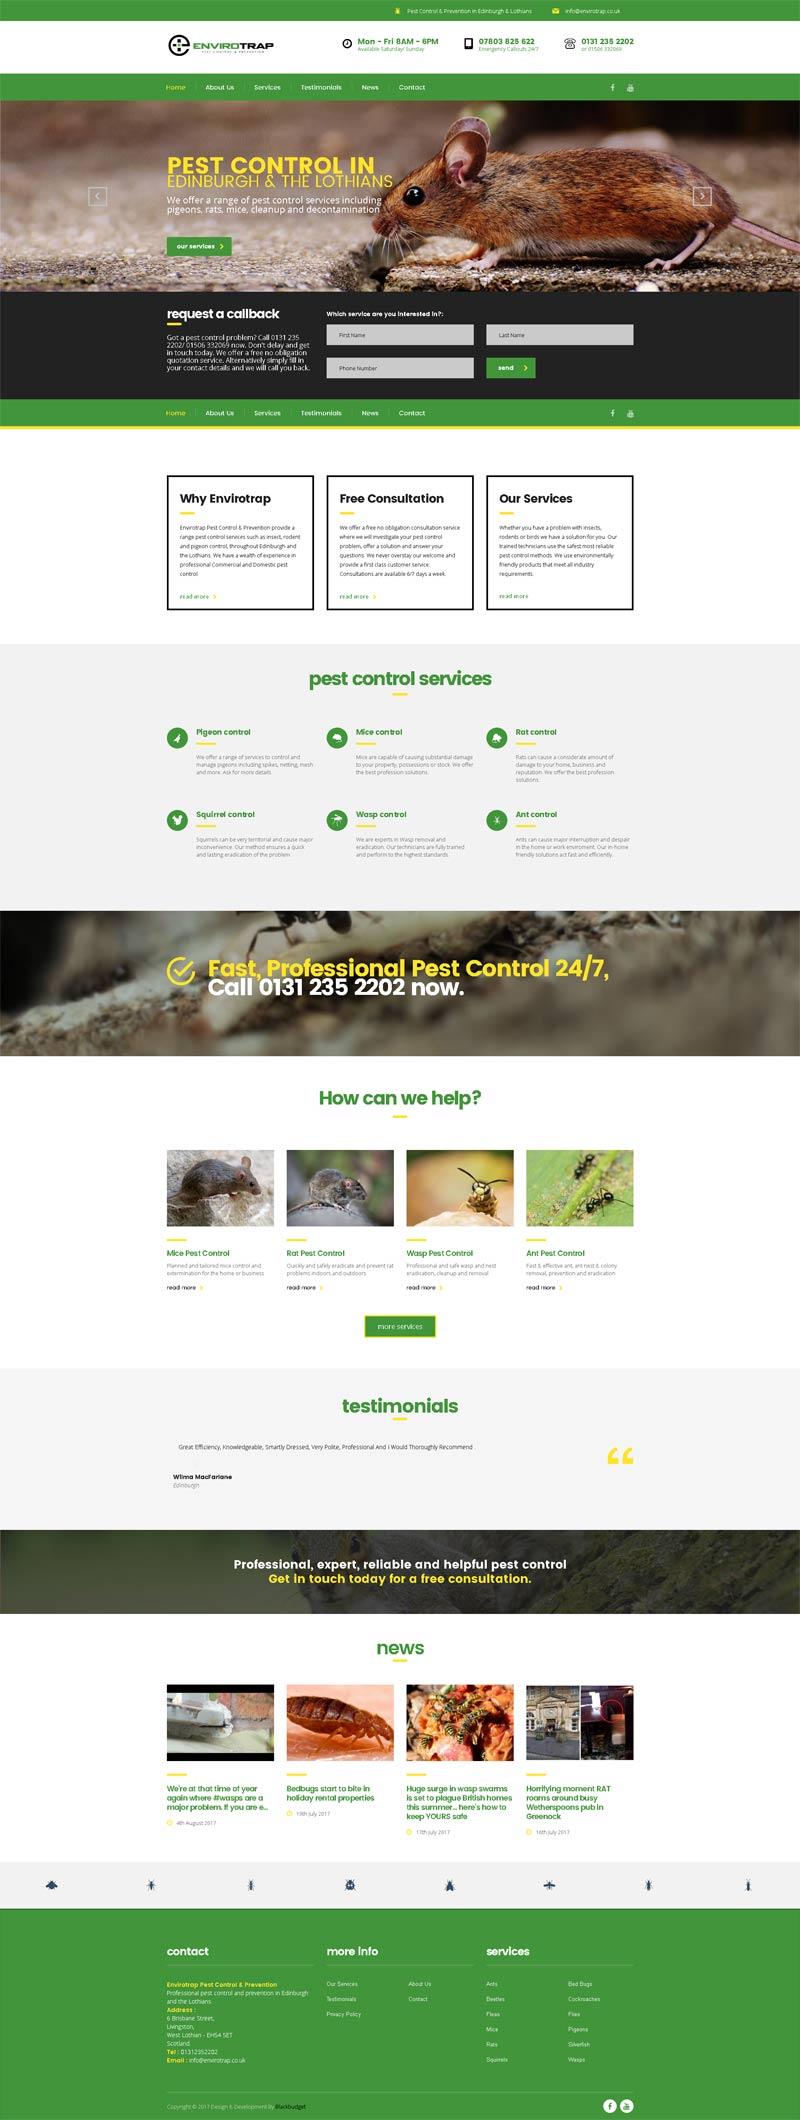 Envirotrap Pest Control